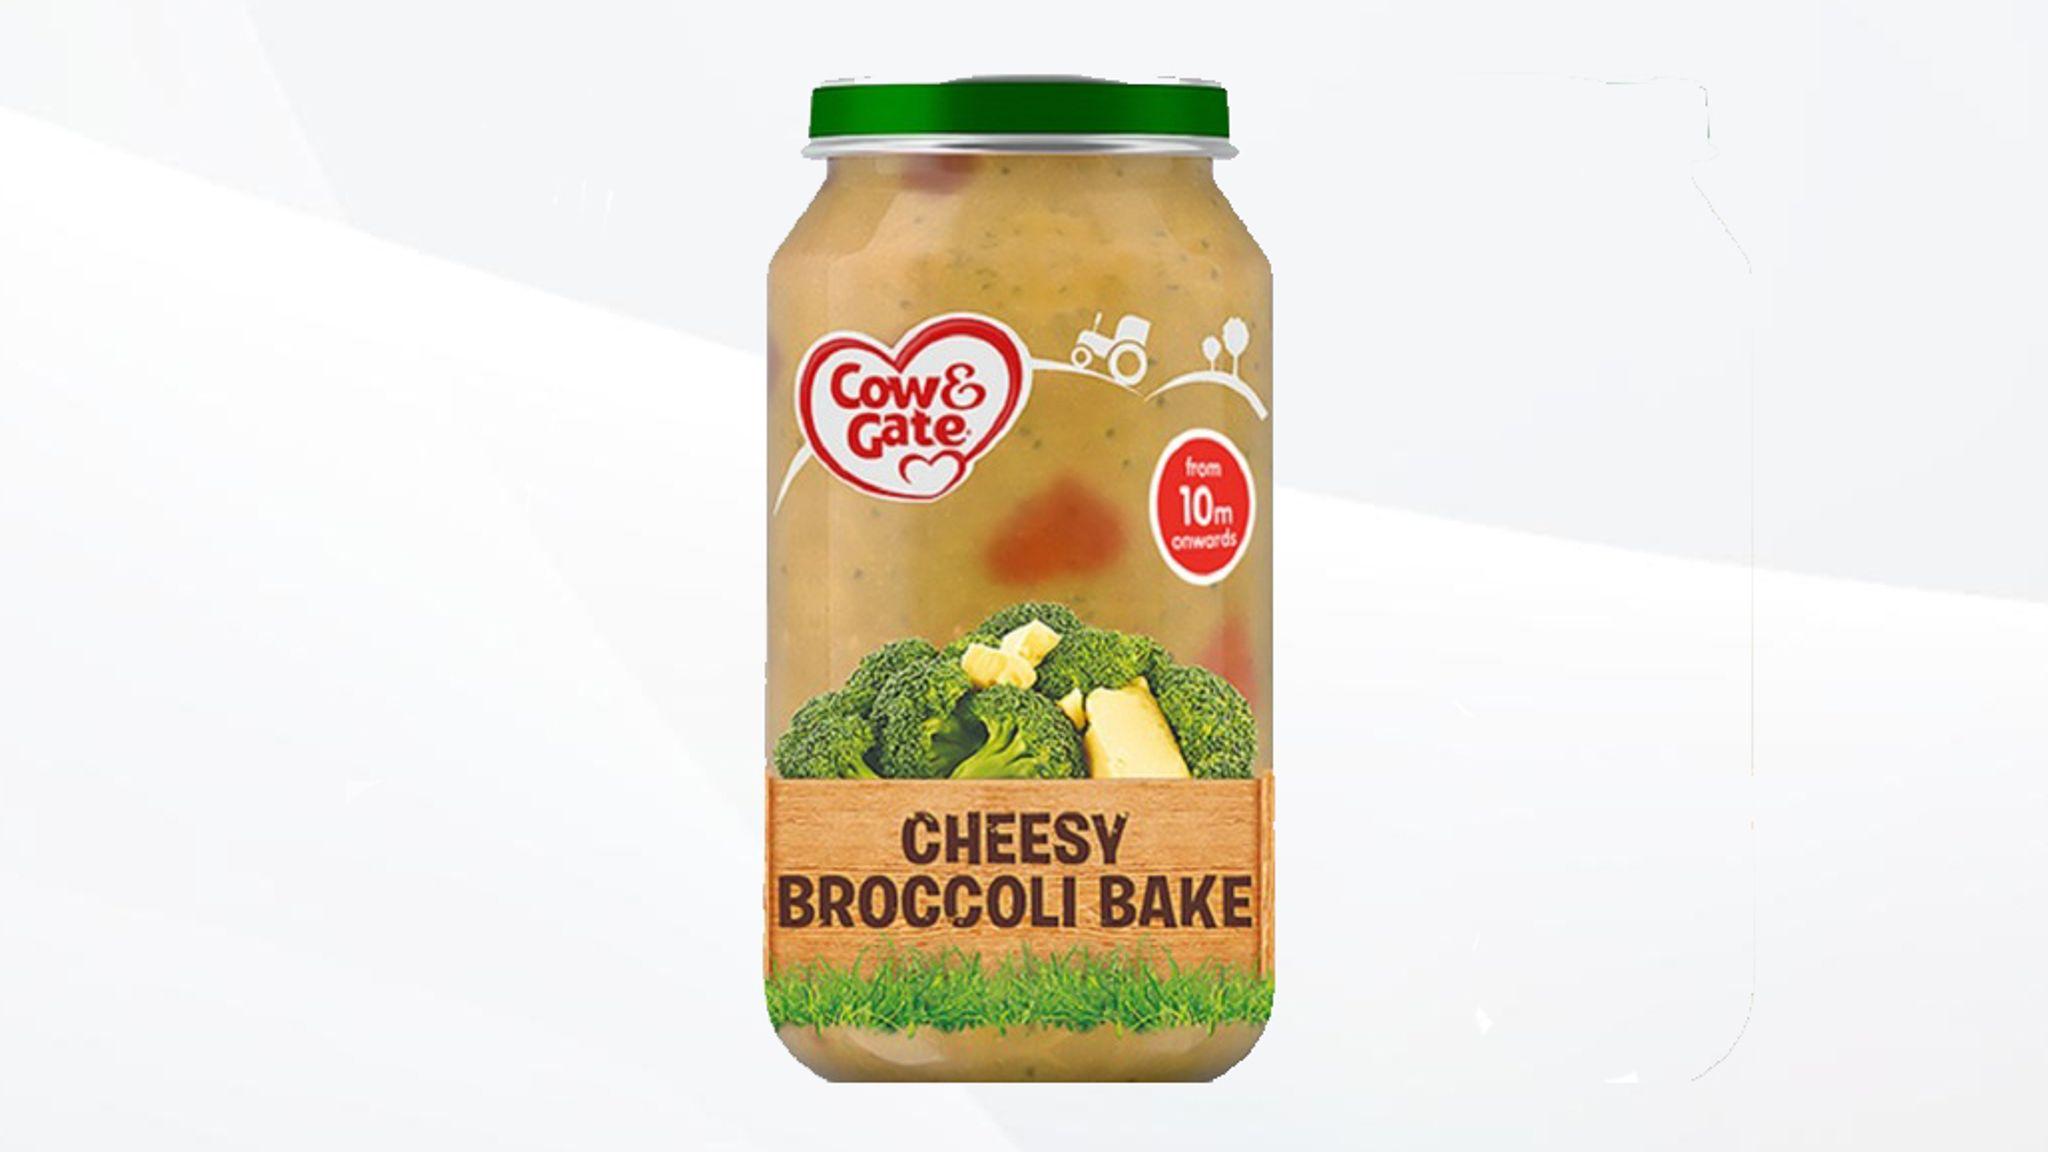 Cow Gate Recalls Cheesy Broccoli Bake Baby Food Uk News